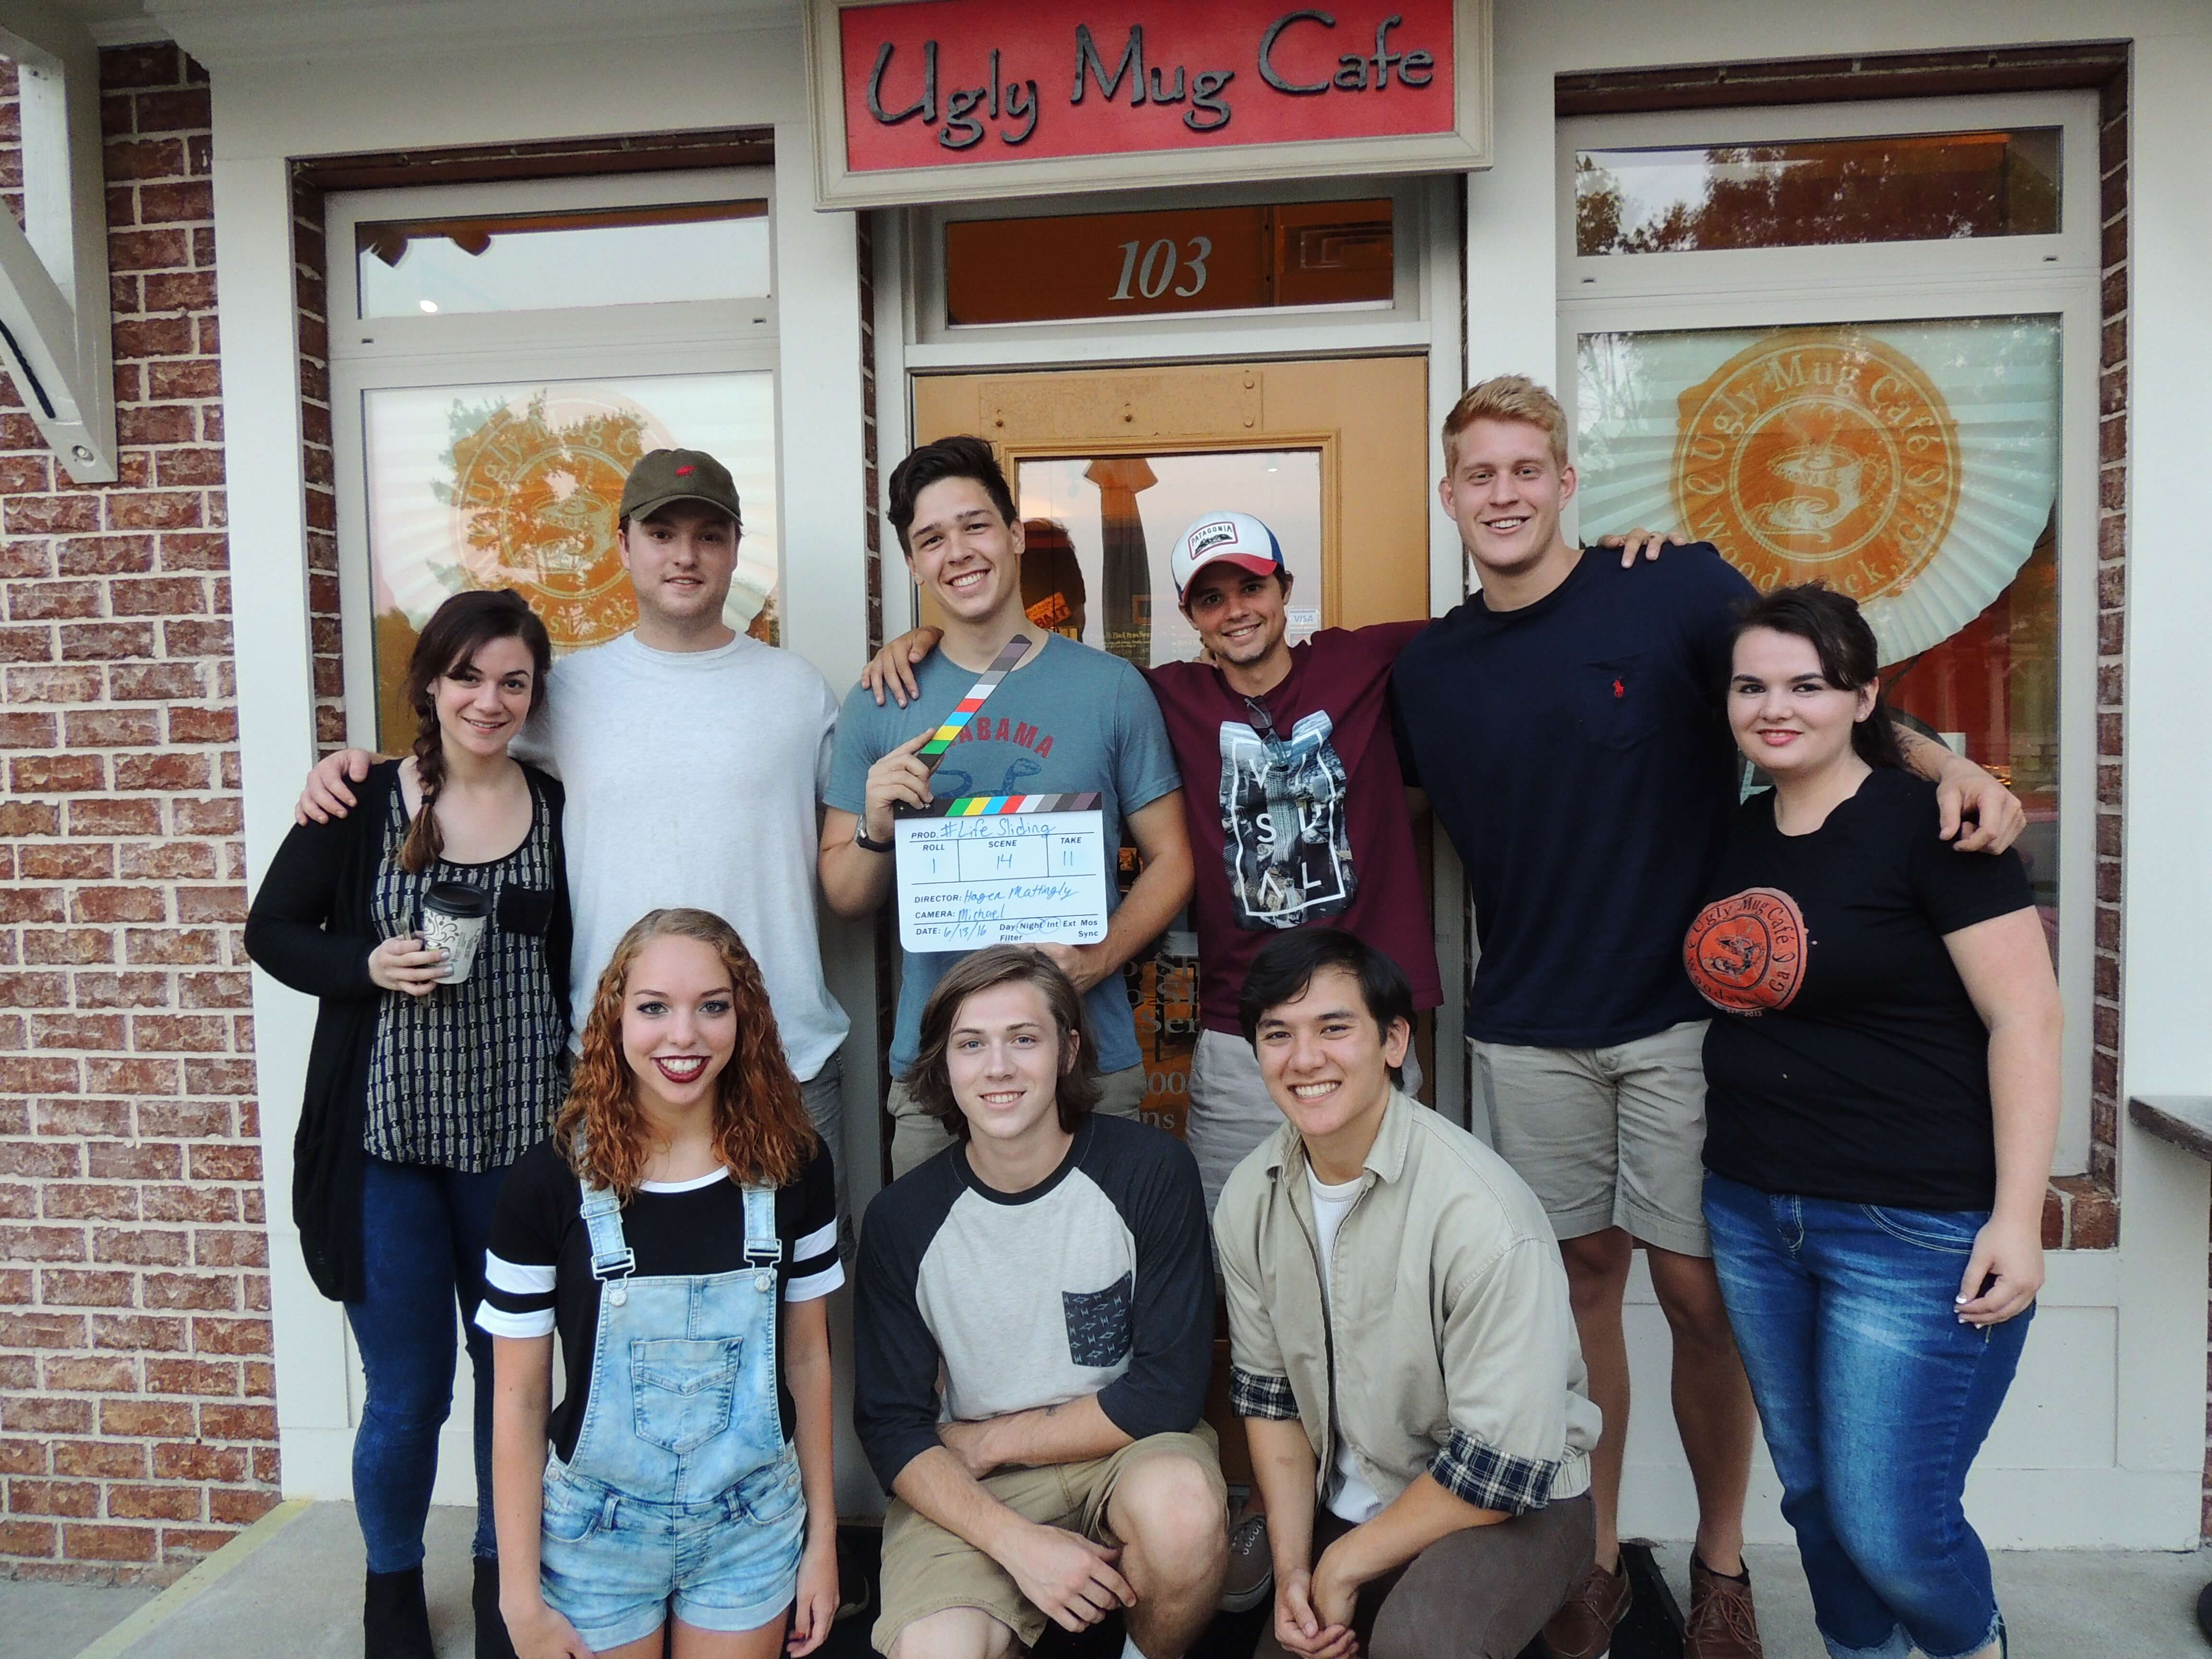 Short Film Uses Local Talent, Locations